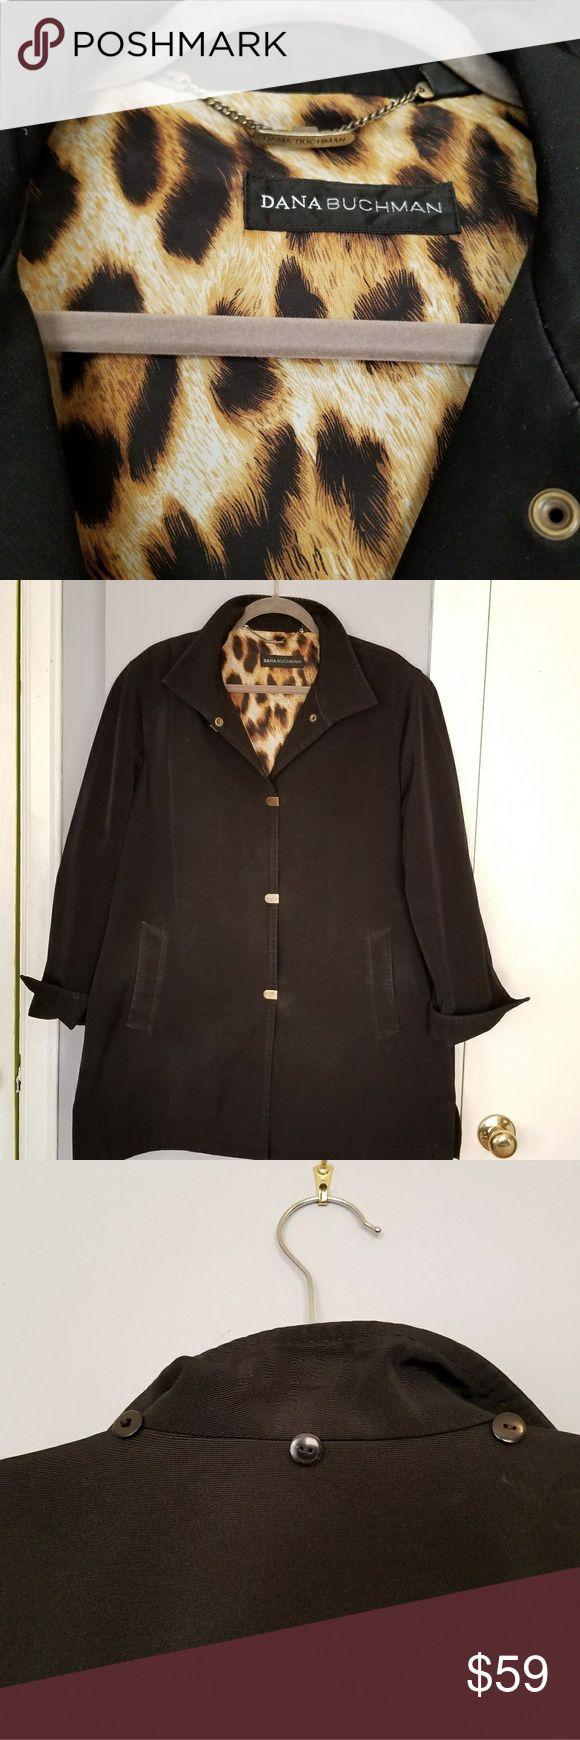 Dana Buchman Coat Black rain jacket/light coat with leopard print lining. Great condition. Dana Buchman Jackets & Coats